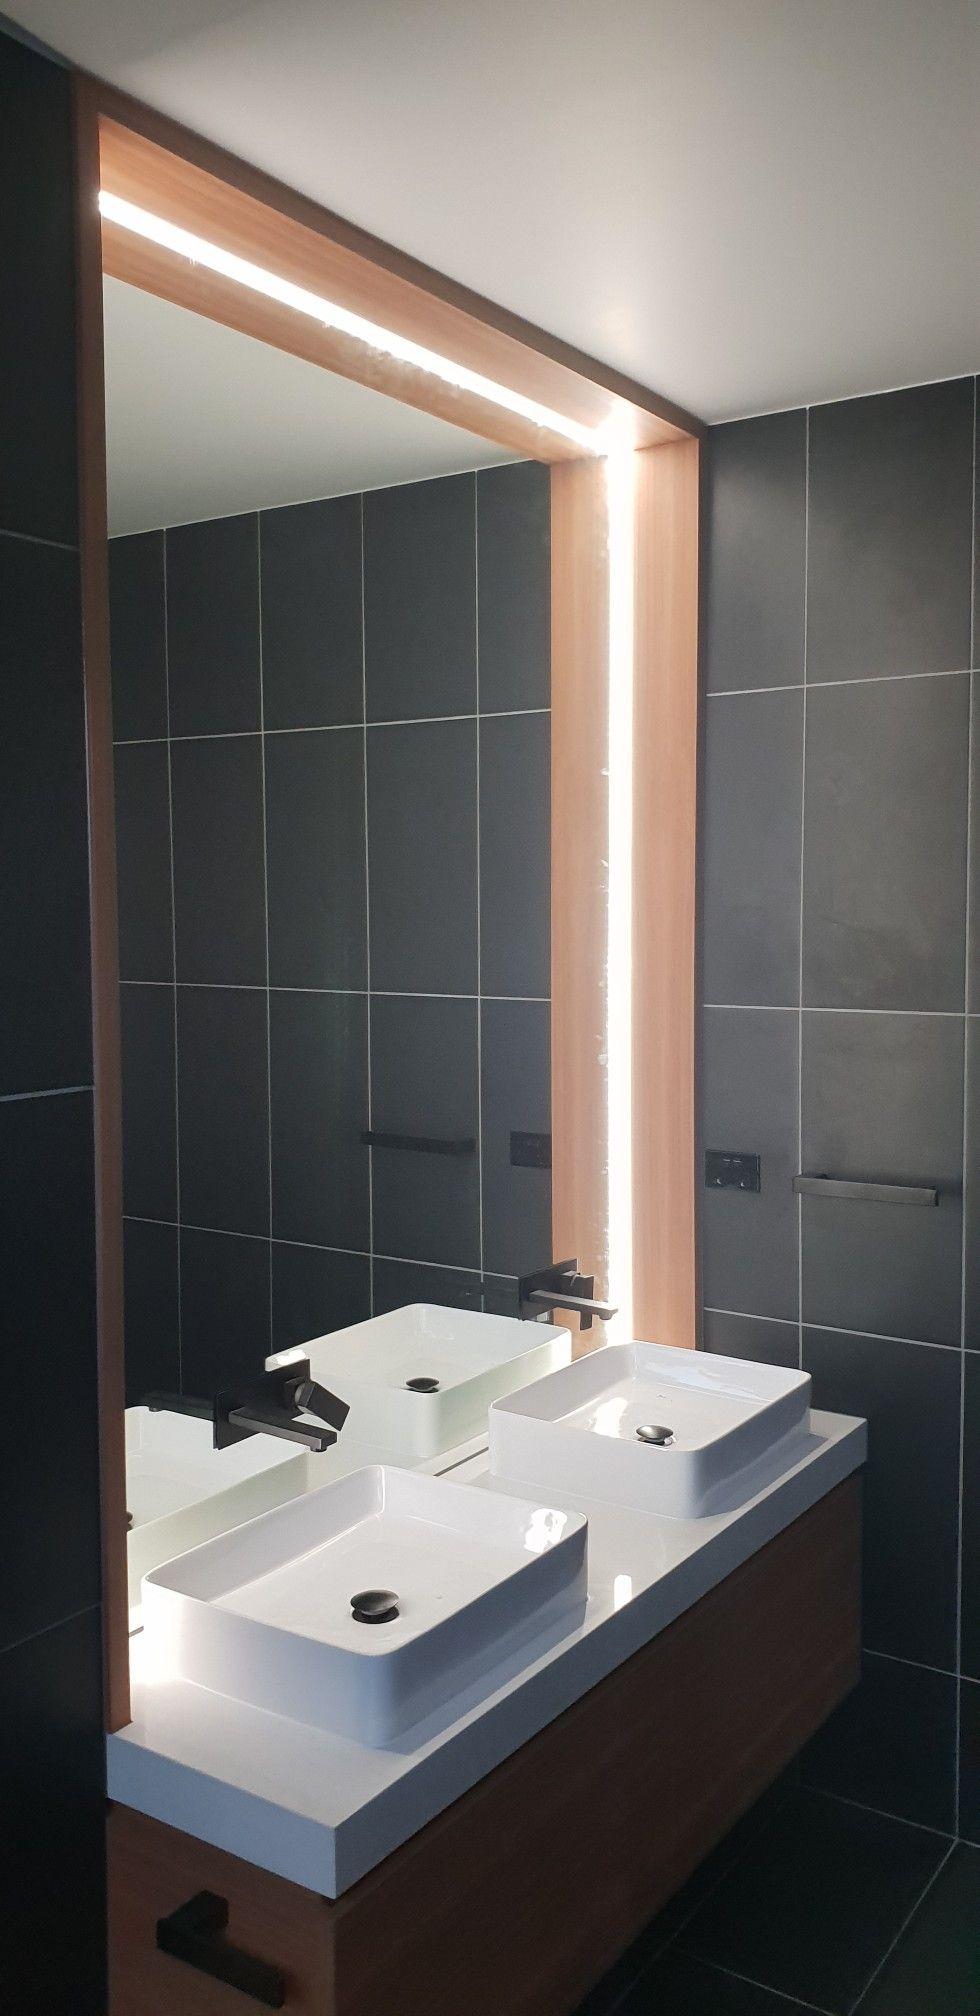 Ensuite Mirror Black Fittings And Led Strip Lighting Strip Lighting Bathroom Design Inspiration Bathroom Design